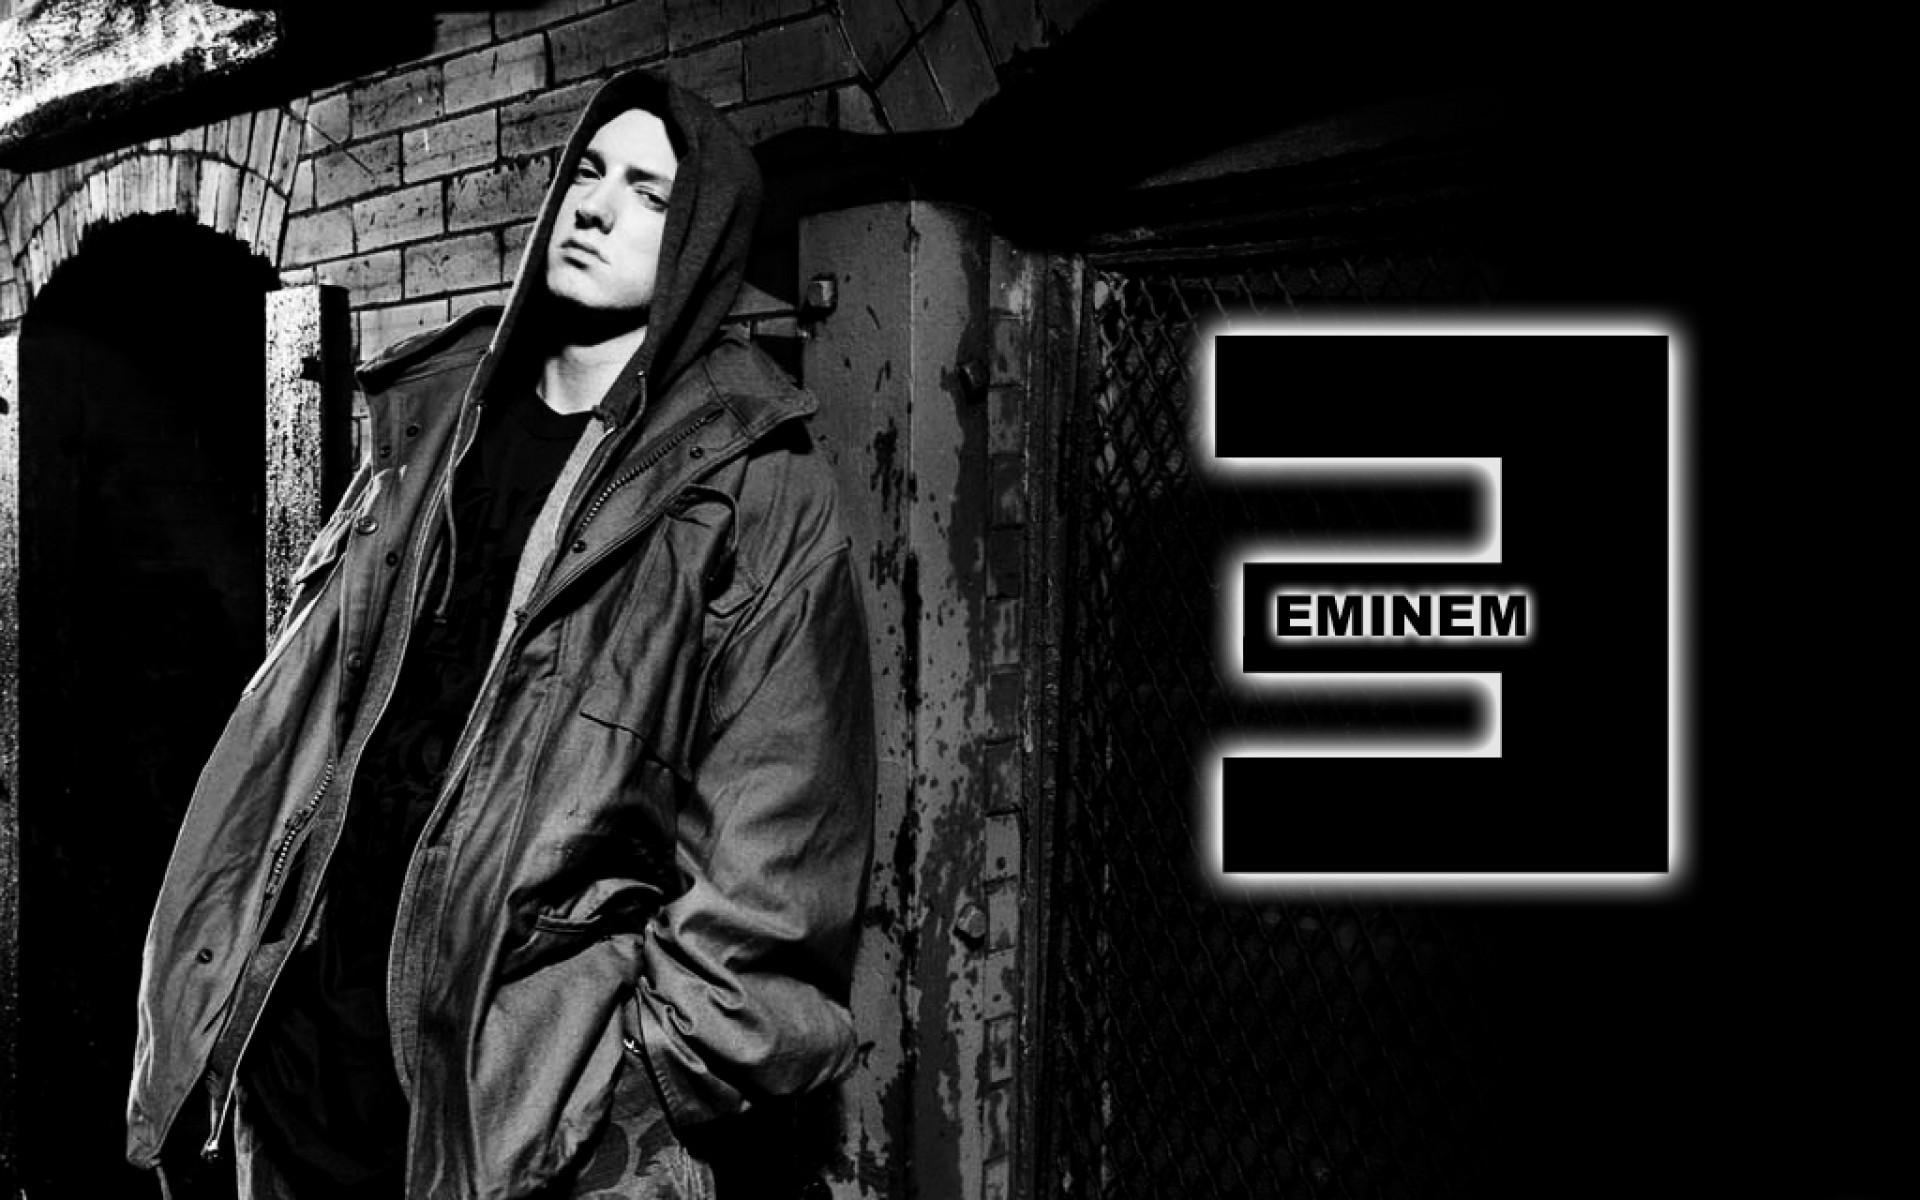 Eminem Wallpaper Hd 2018 79 Pictures